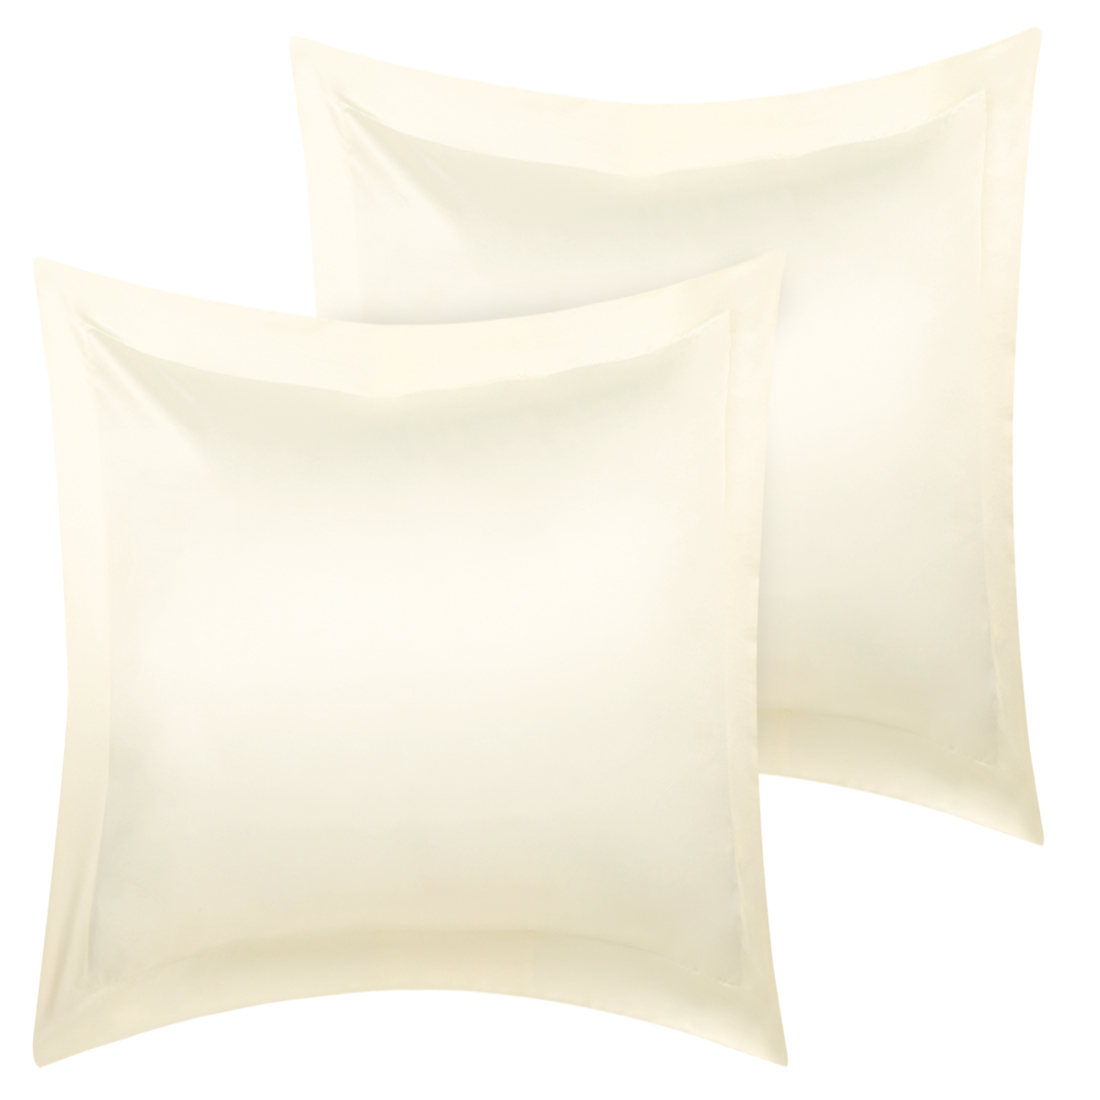 2 Pcs Cream Pillow Shams Satin Pillow Cases European Oxford Pillowcases